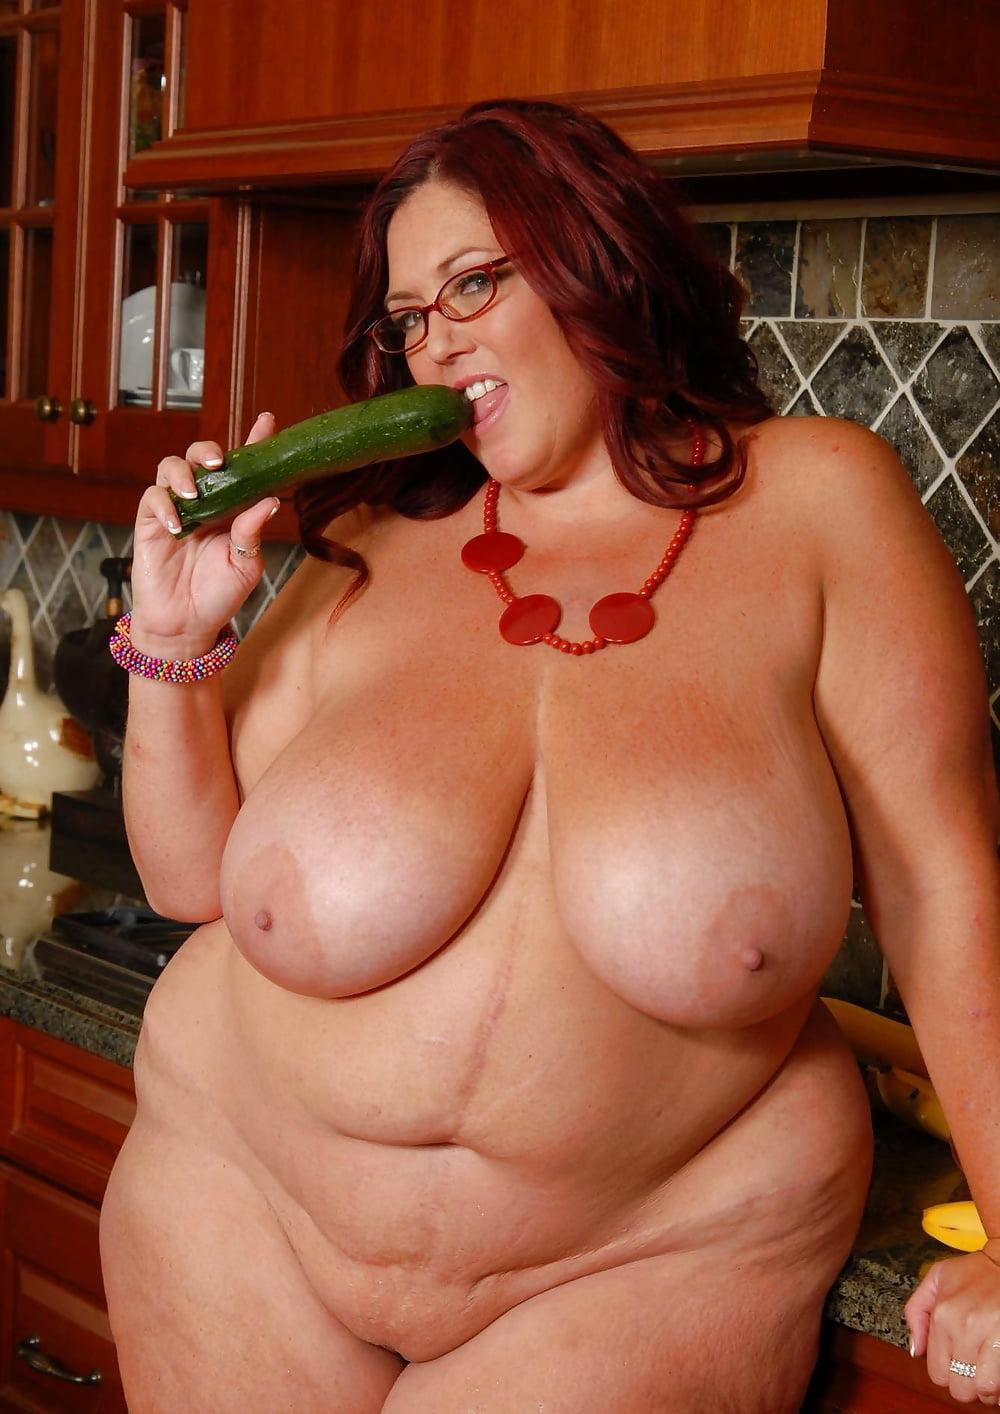 fucks-arab-peaches-larue-porn-actress